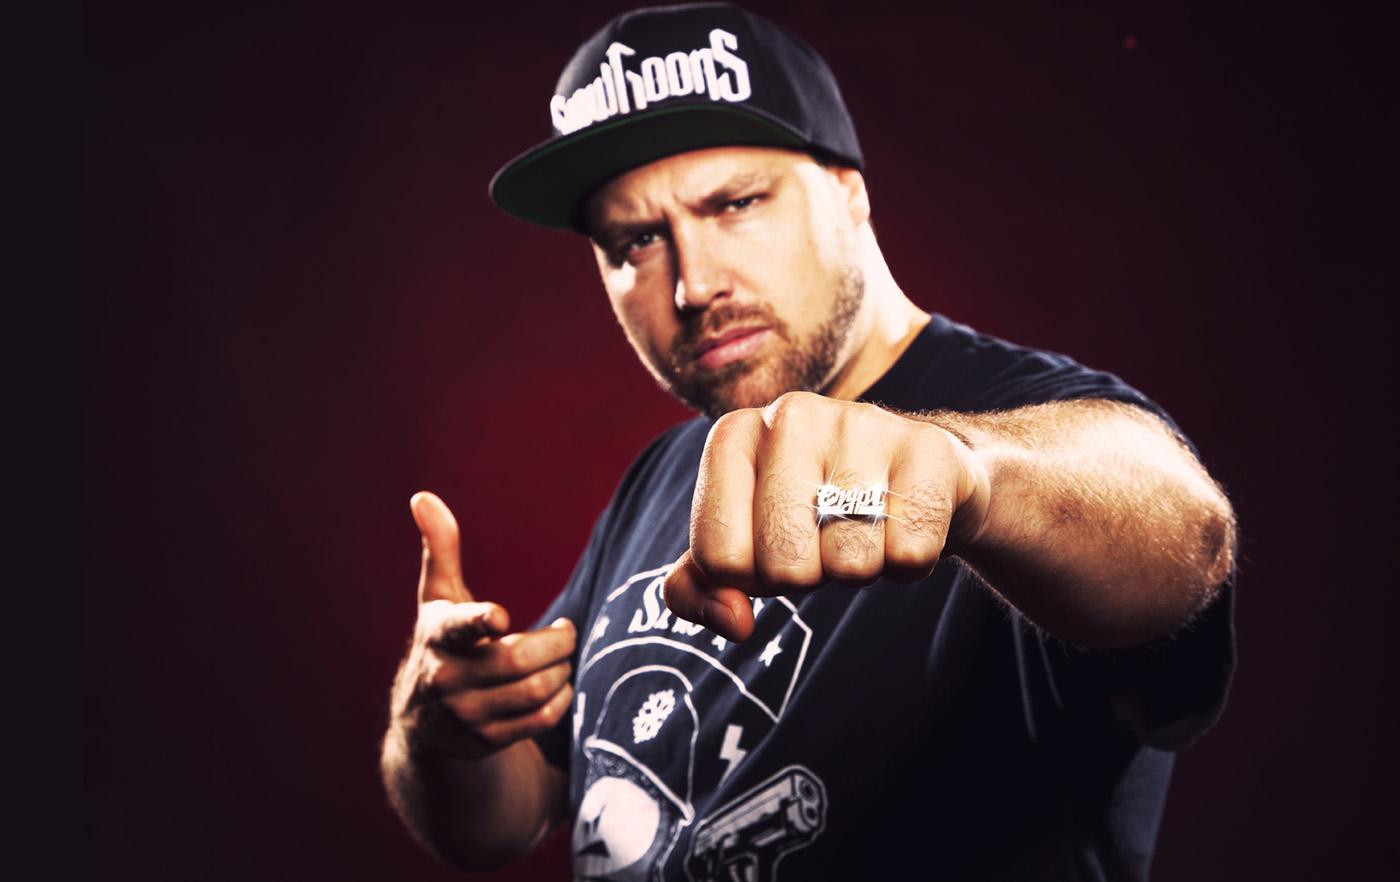 DJ Crypt